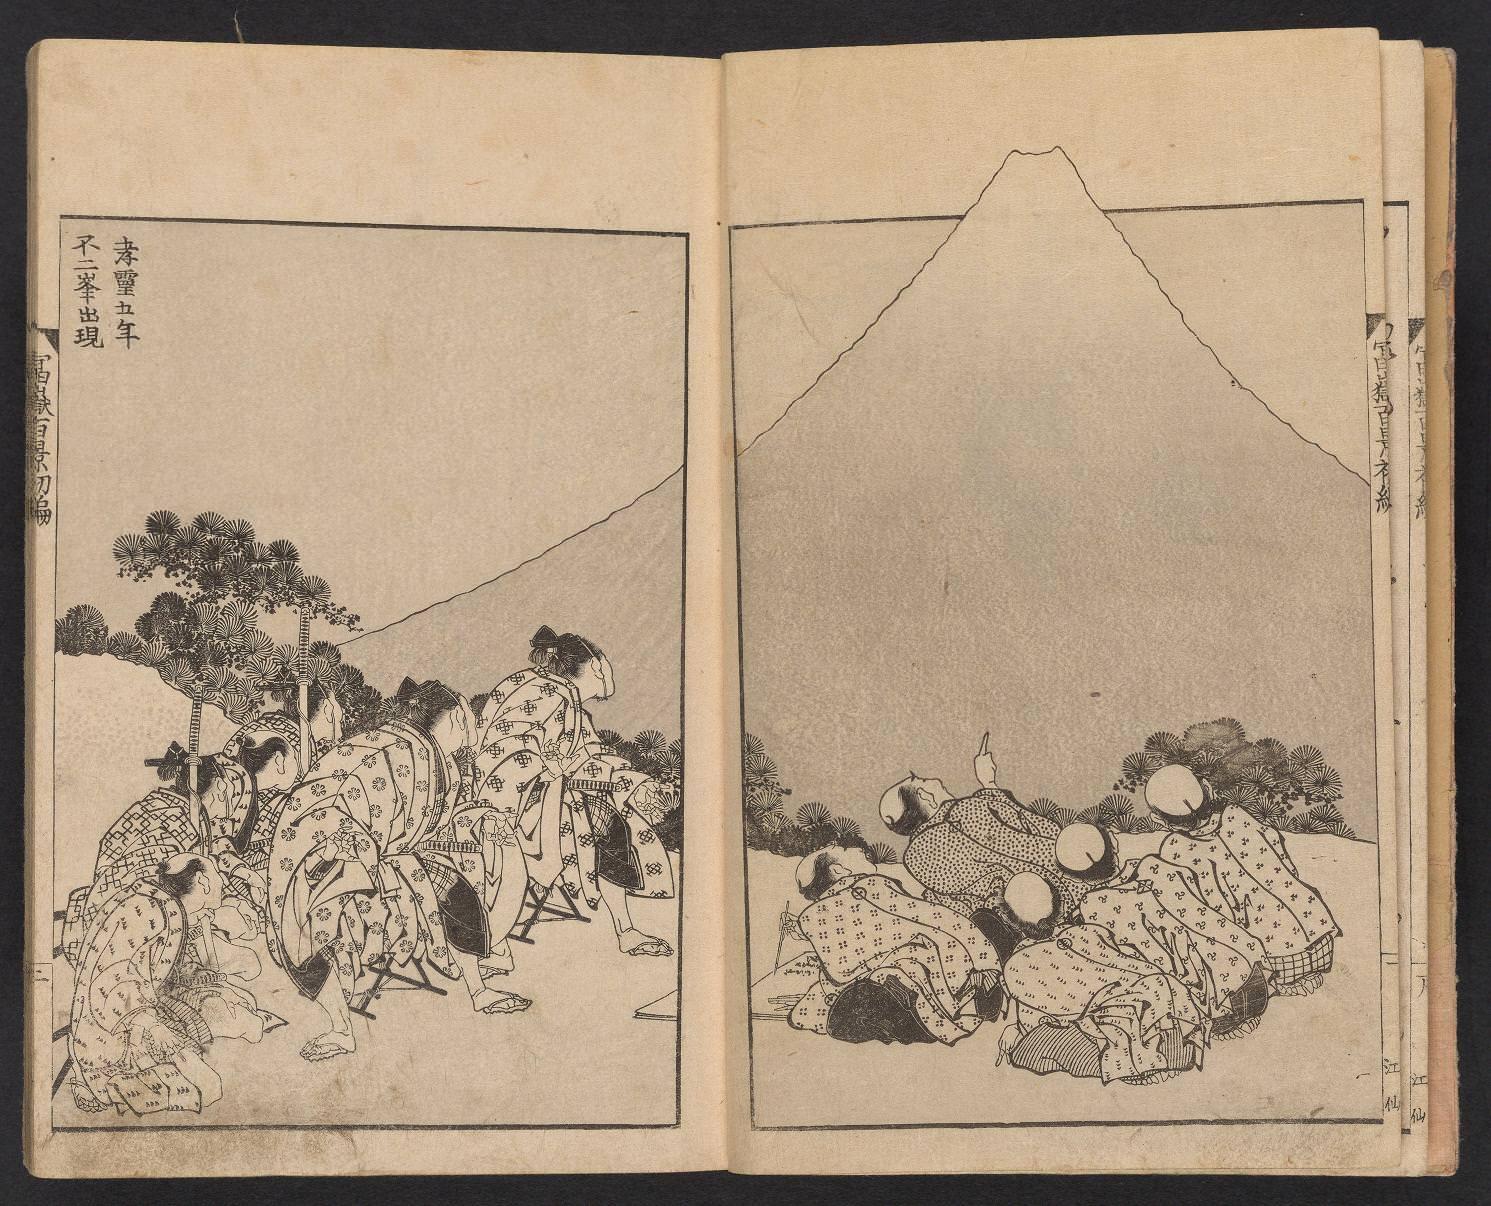 libri-illustrati-giapponesi-smithsonian-04